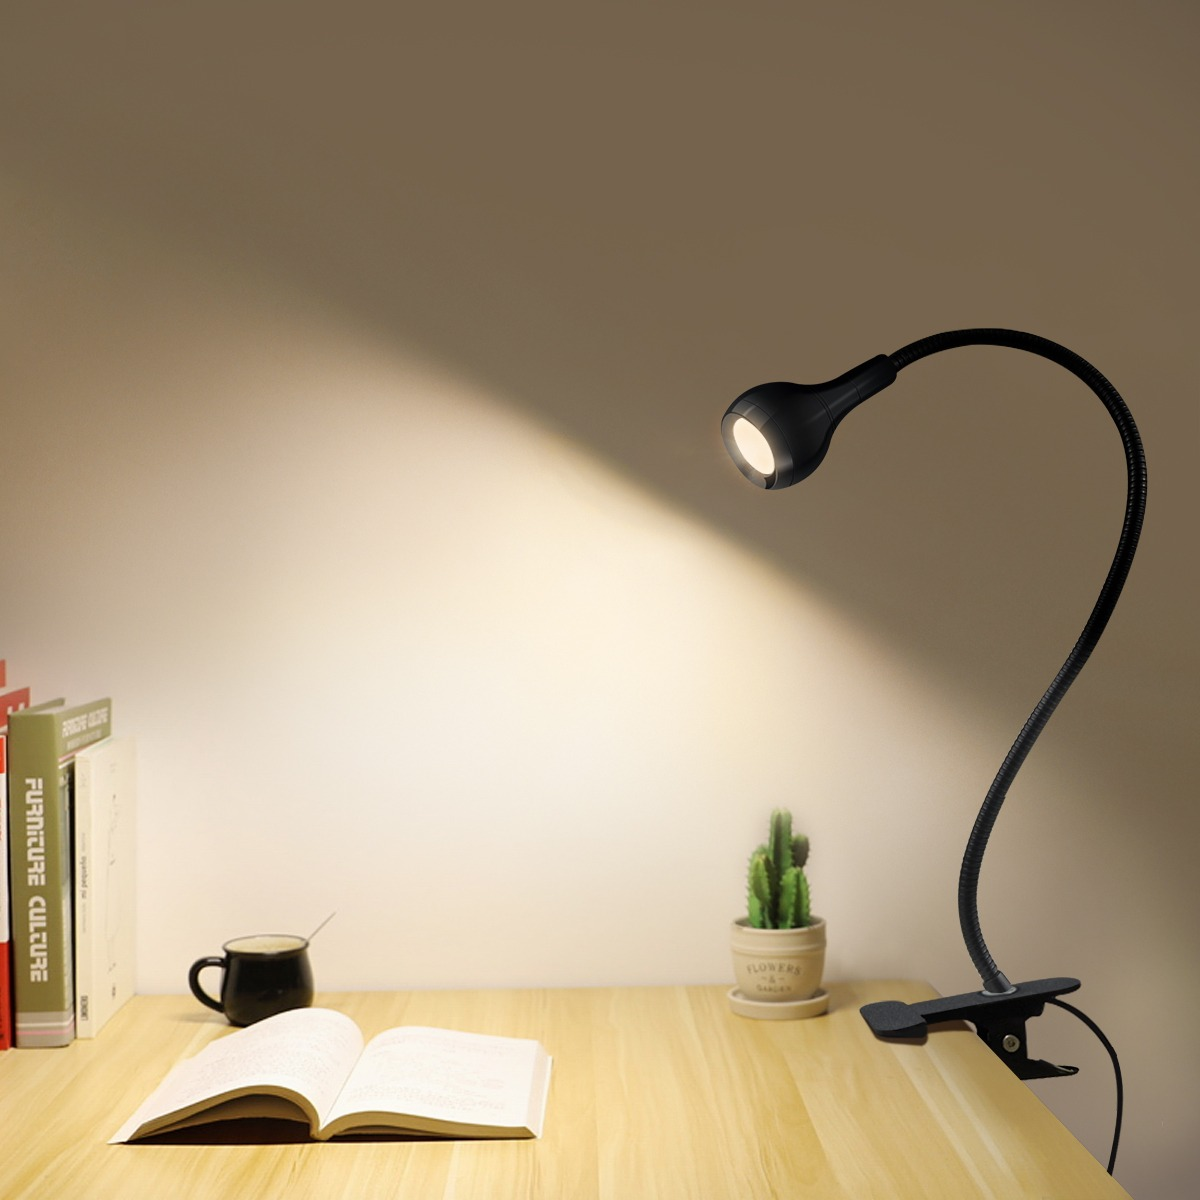 Led Schreibtisch Lampe Mit Clip 1 W Flexible Led Lesen Lampe Usb Netzteil Led Buch Lampe. Lampen & Schirme